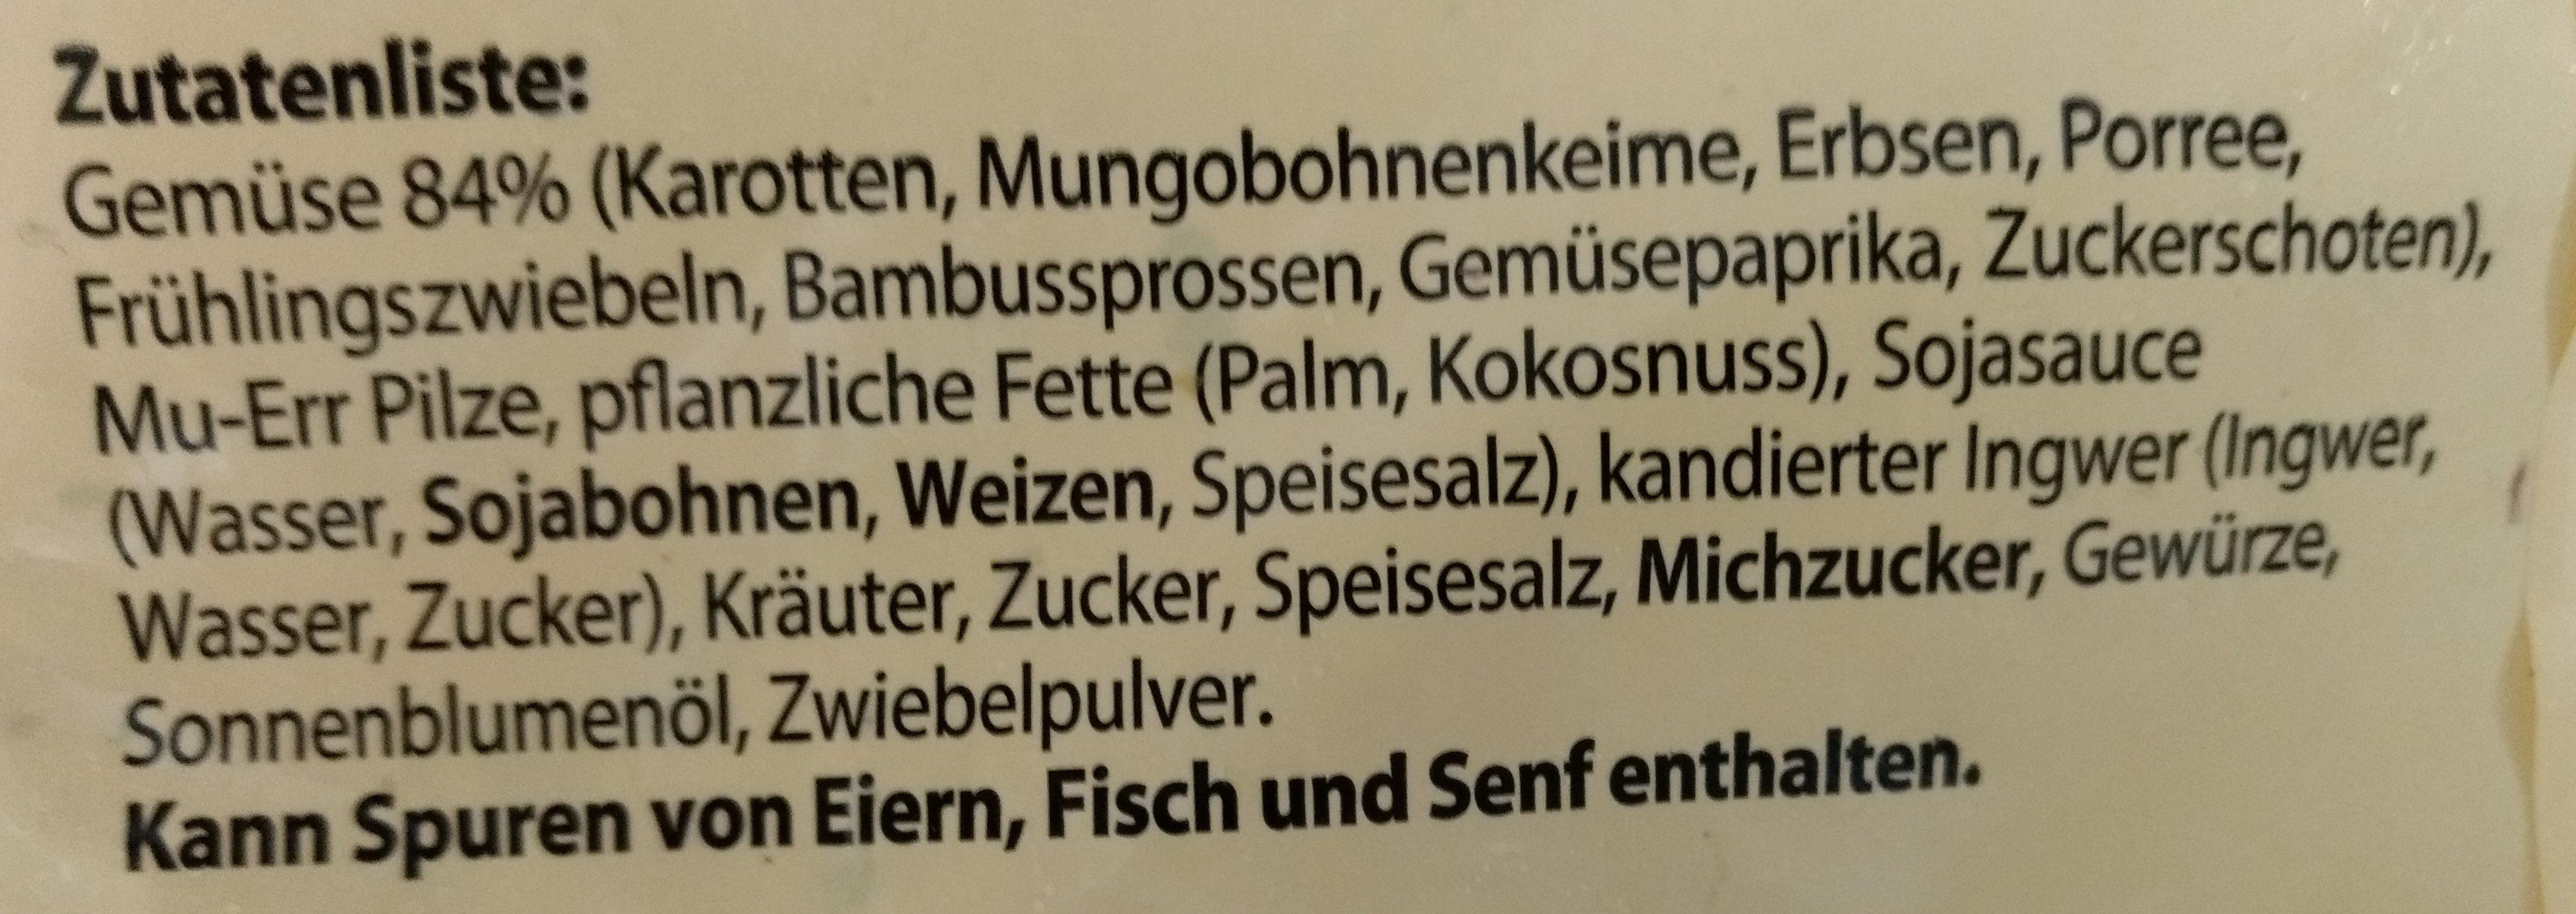 Feinschmecker art pfannengemüse - Ingredients - de